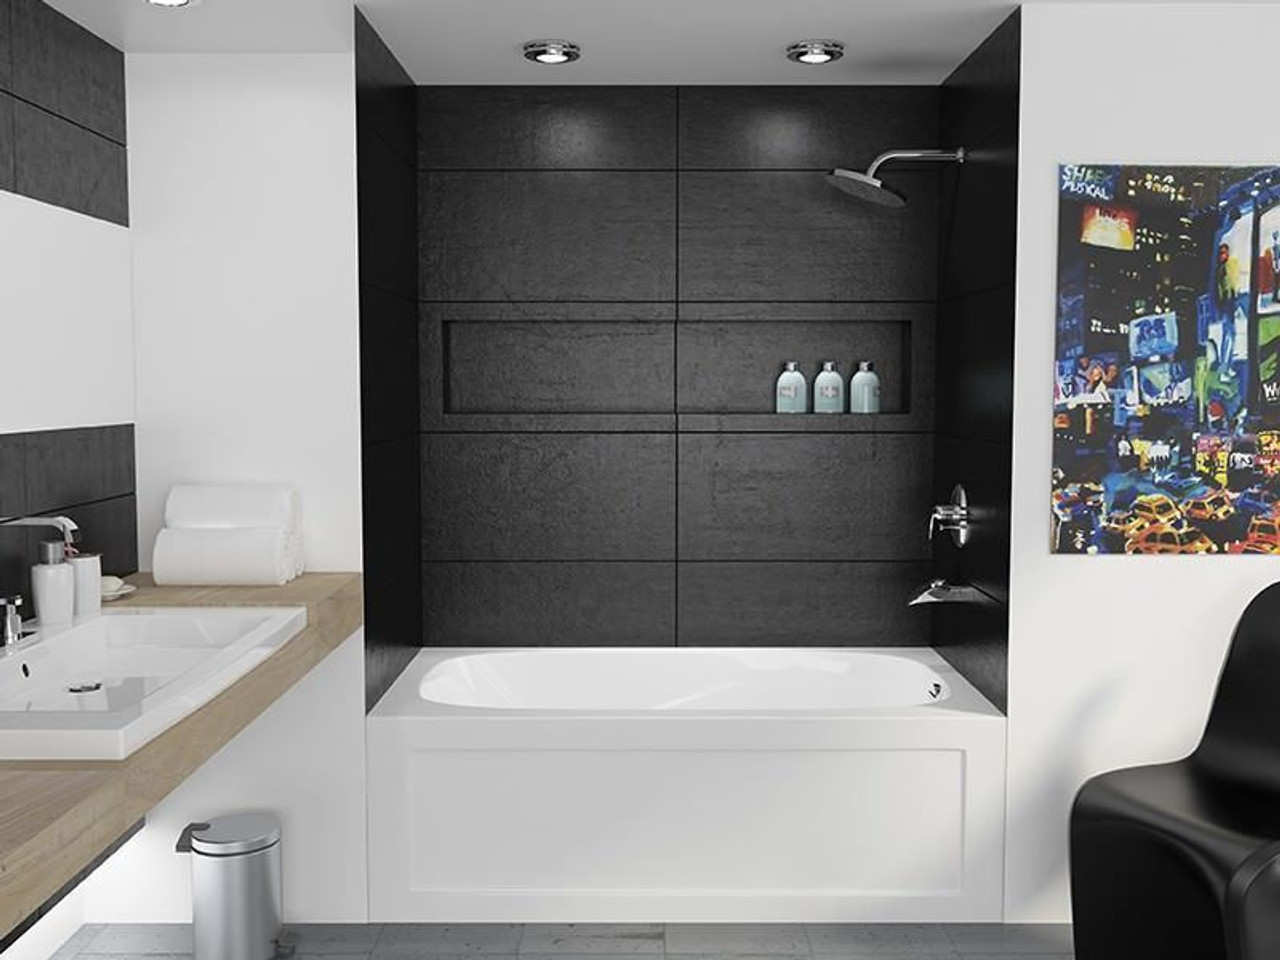 mirolin tucson skirted bath tub 60 x 32 right hand drain - york taps